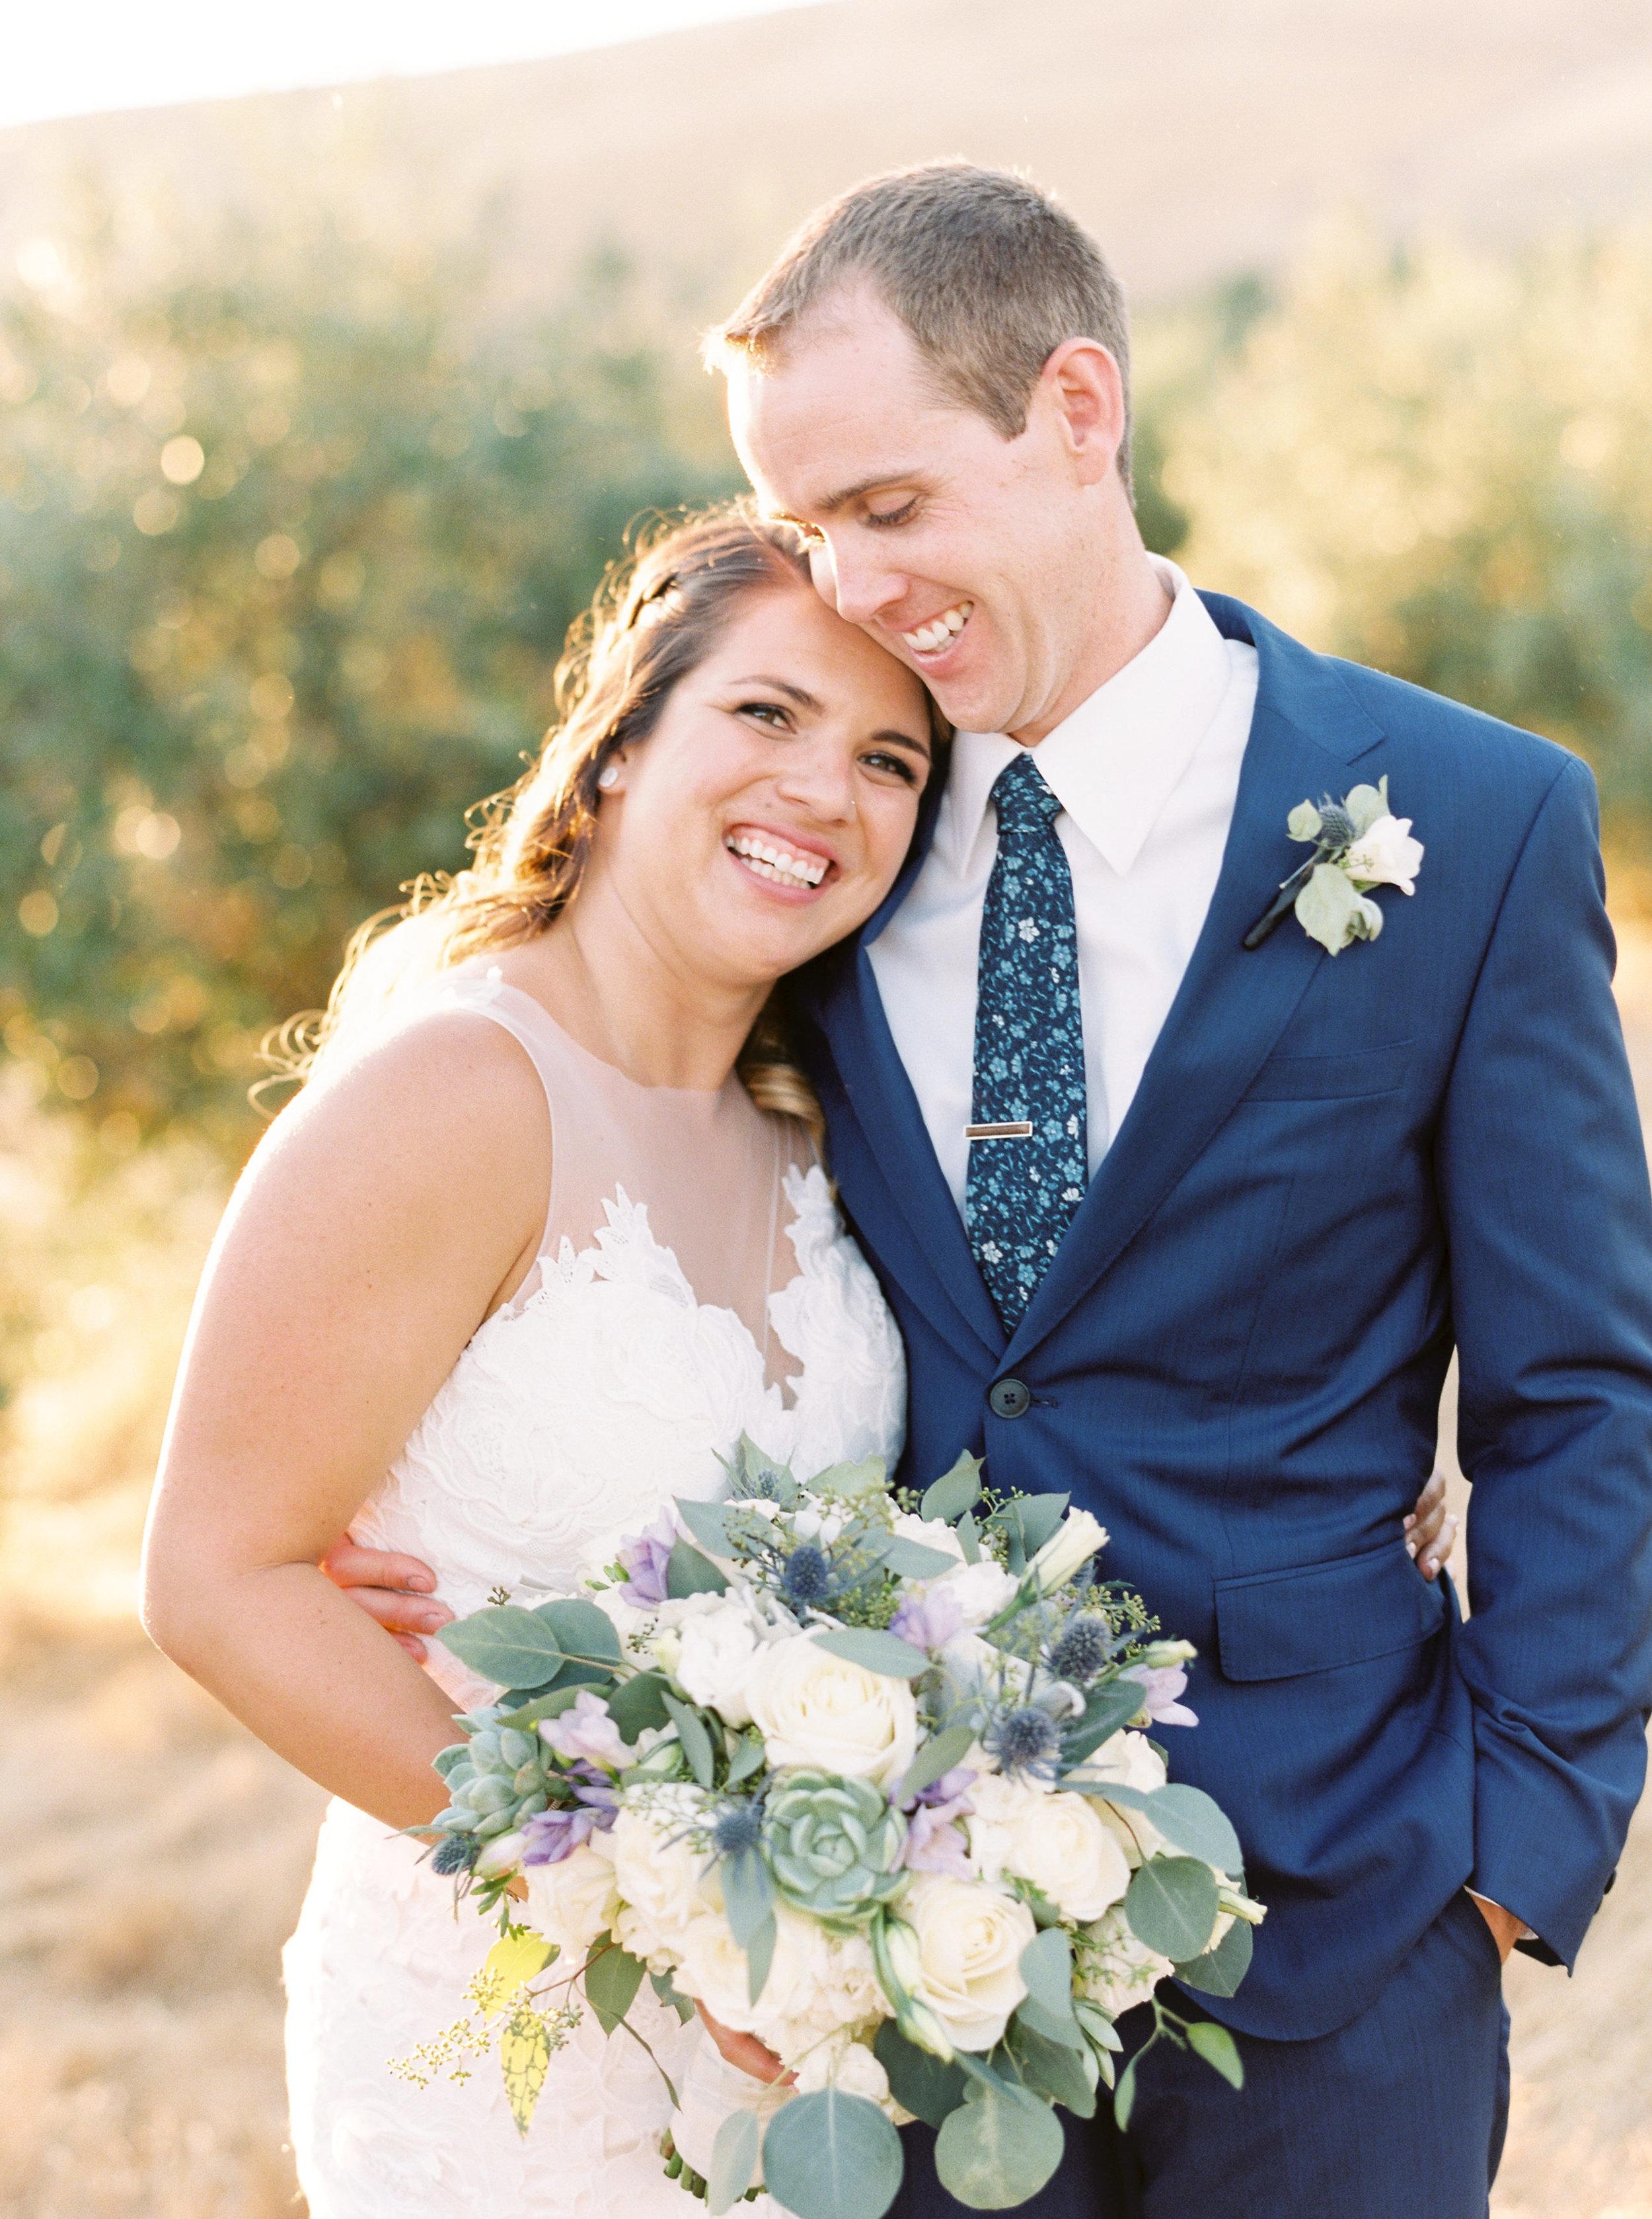 the-purple-orchid-resort-wedding-in-livermore-california-170.jpg